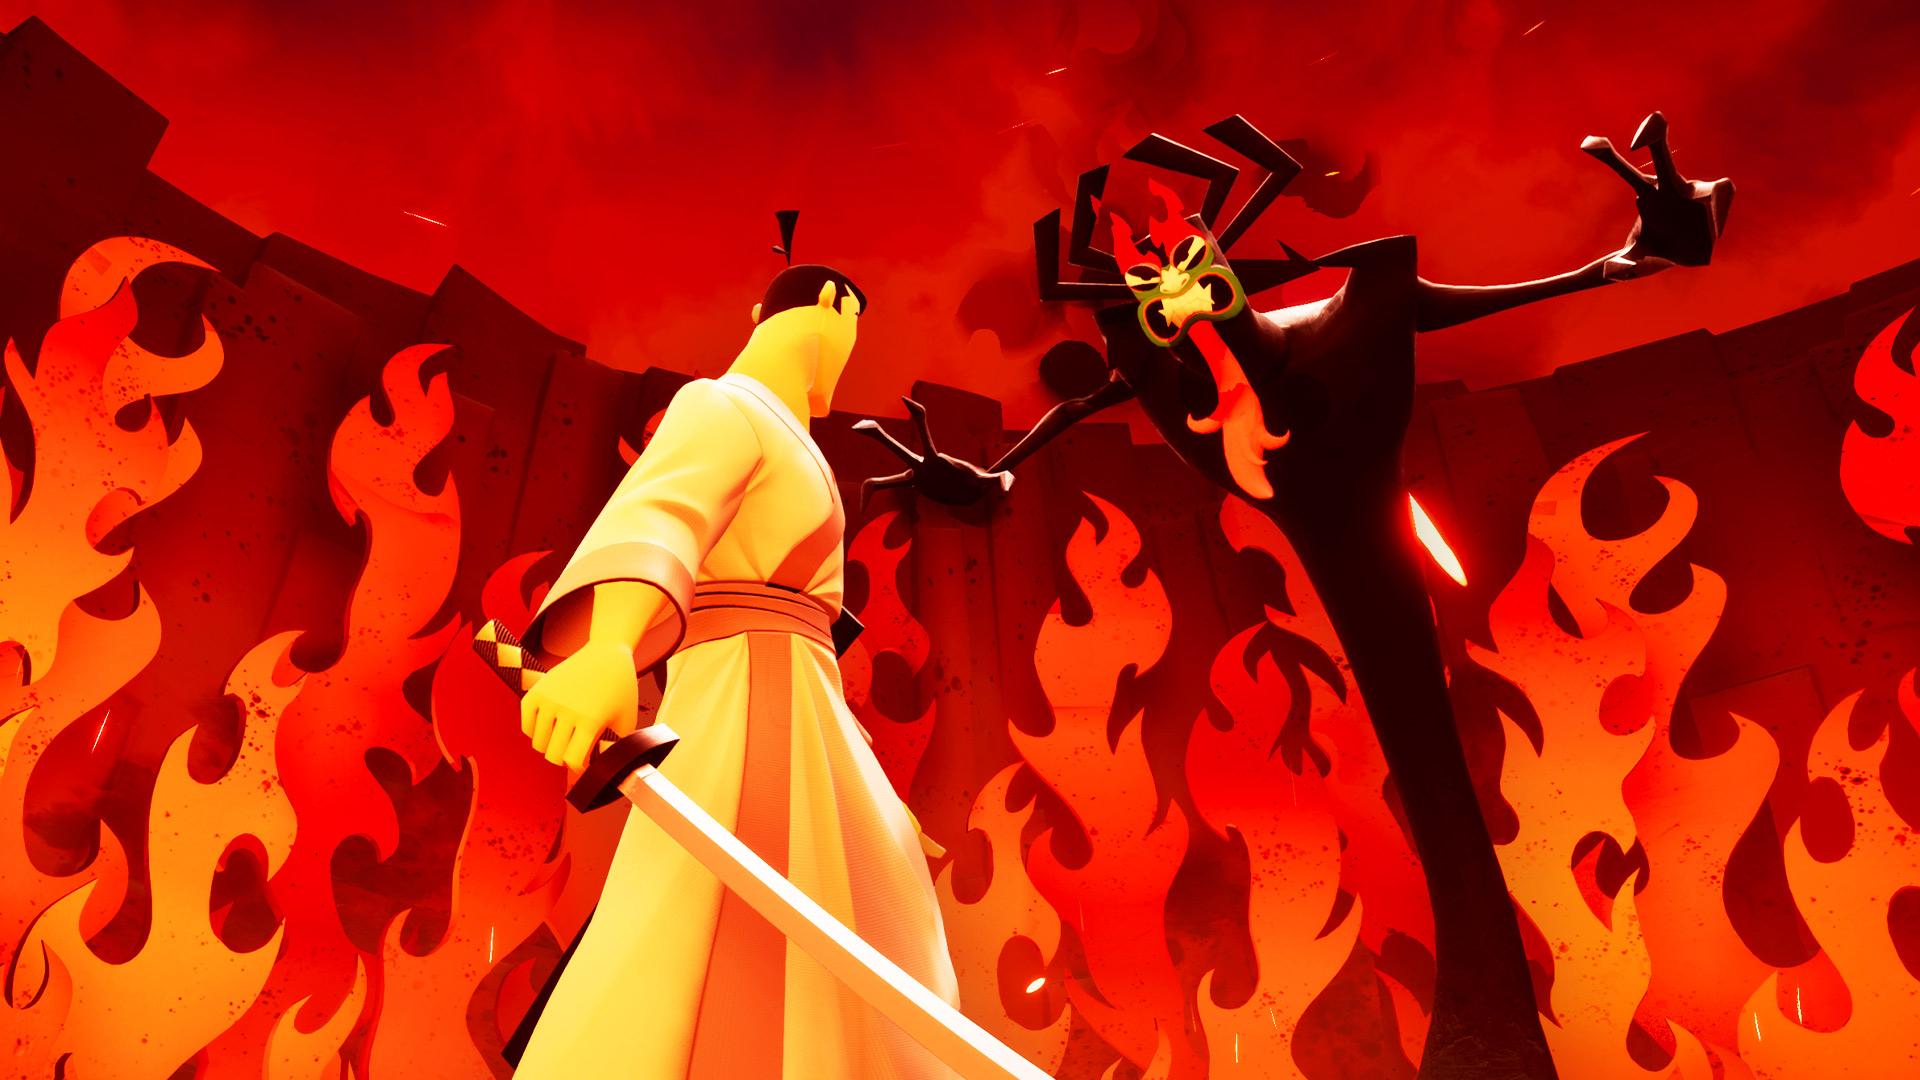 The Next Samurai Jack Game Is Samurai Jack Battle Through Time